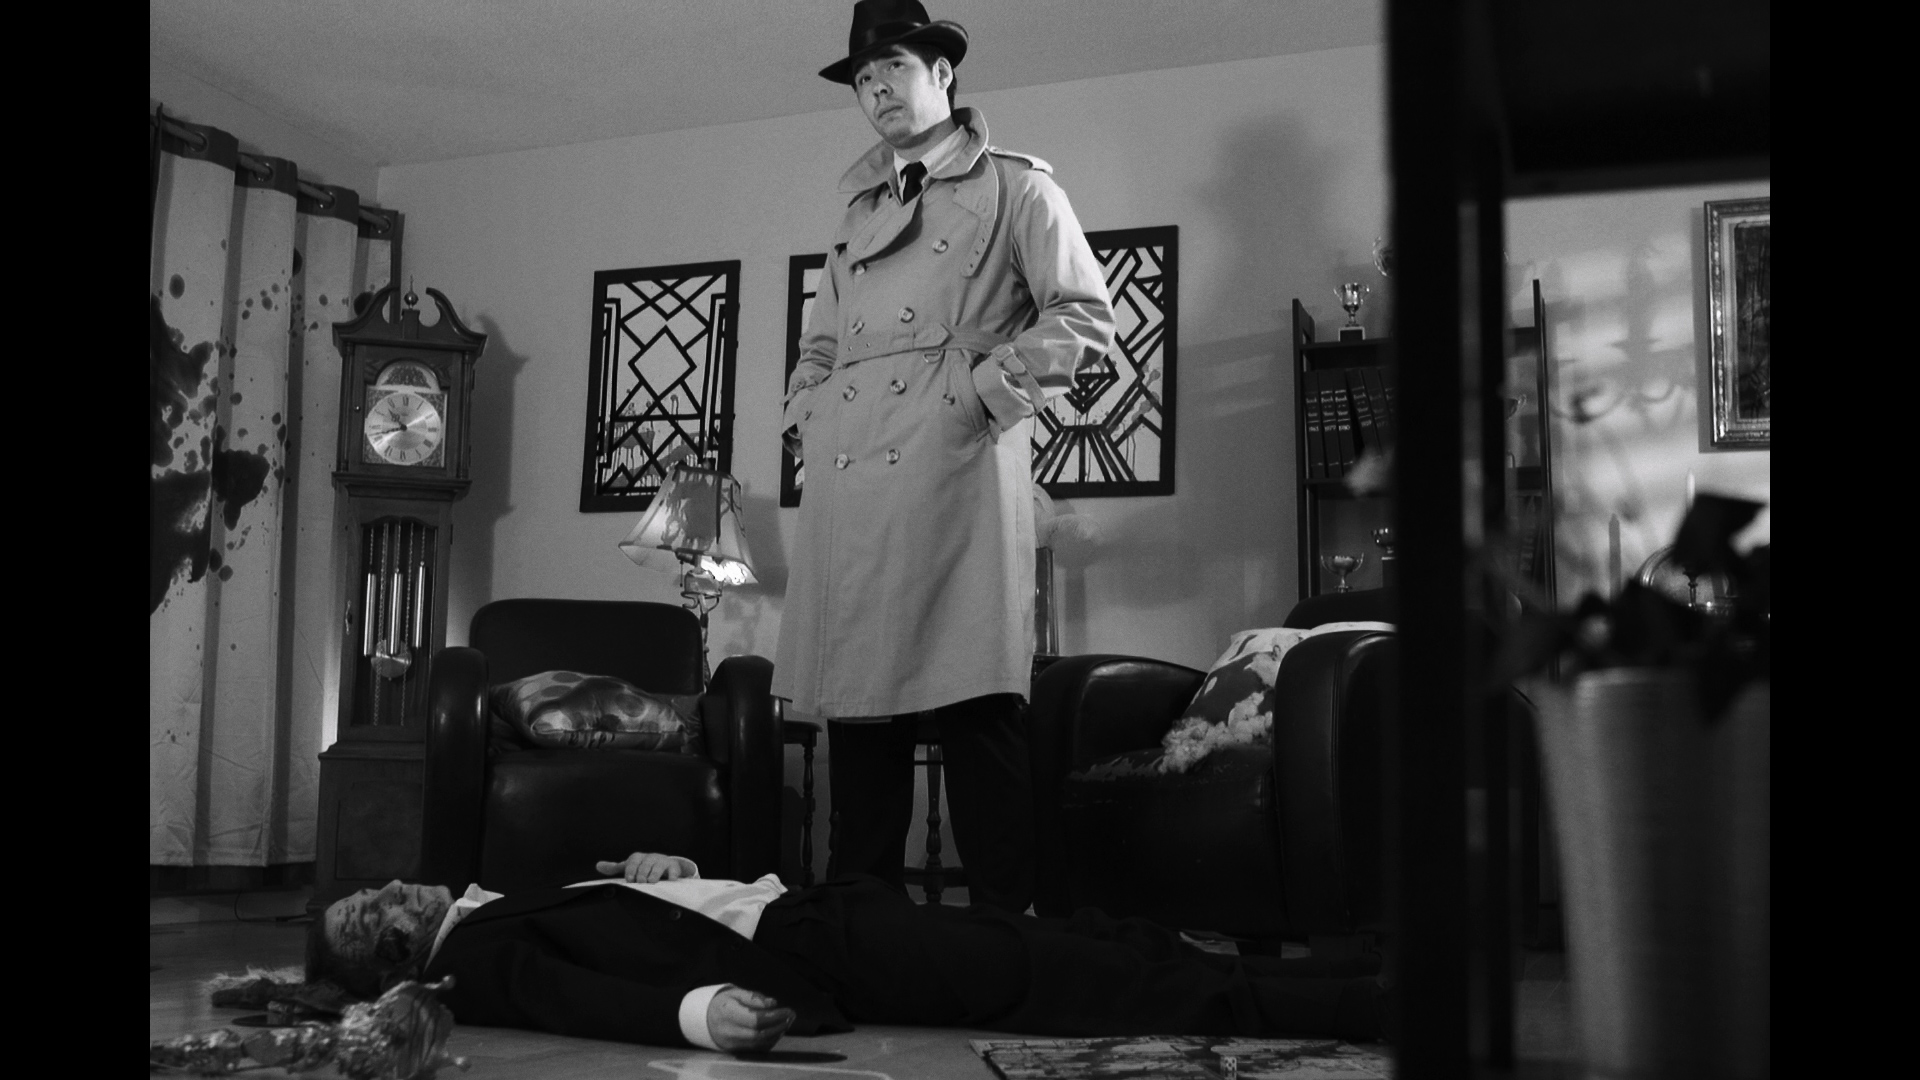 David Rajsic & Kristen McNaule - Saint Charles Place  A smooth talking detective interrogates a vicious femme fatale, but first he needs a cigarette.